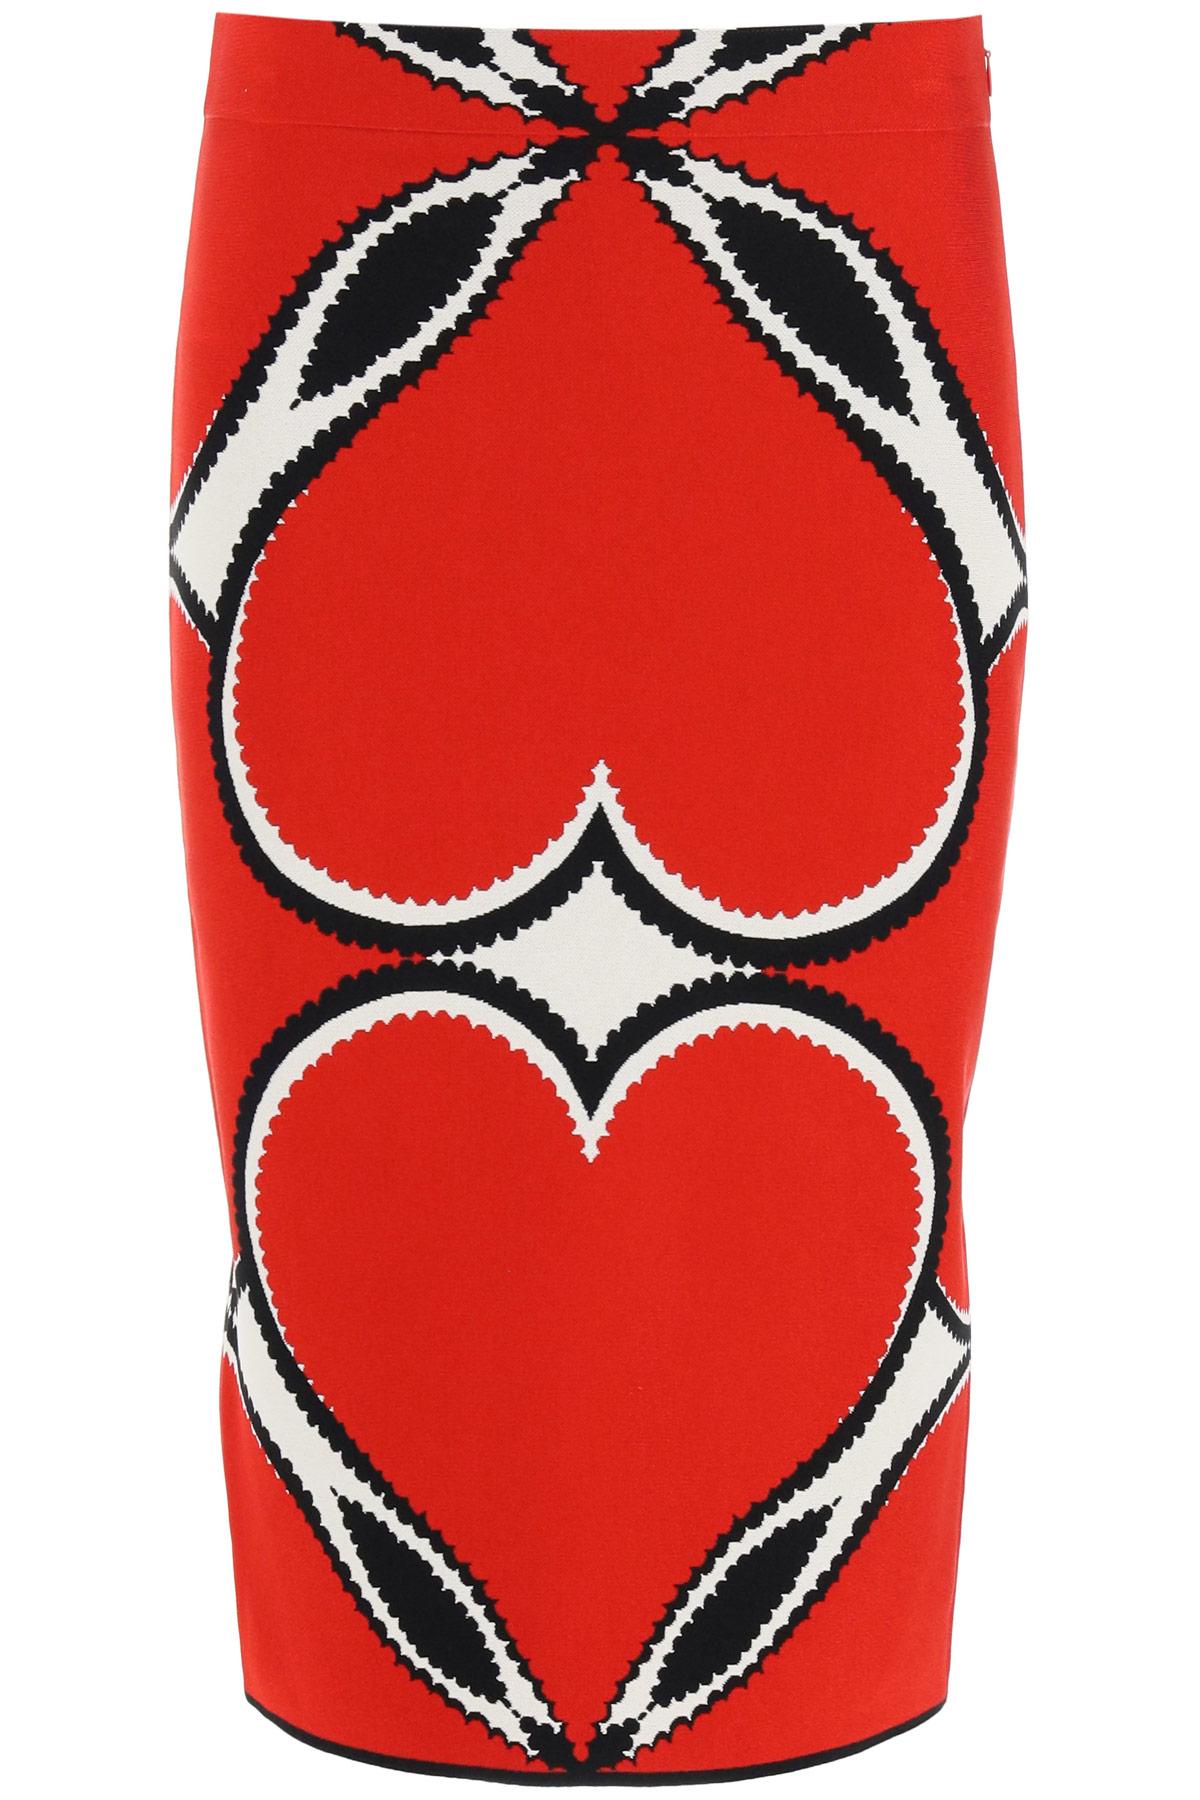 ALEXANDER MCQUEEN LOVE HEART PENCIL SKIRT XS Red, Black, White